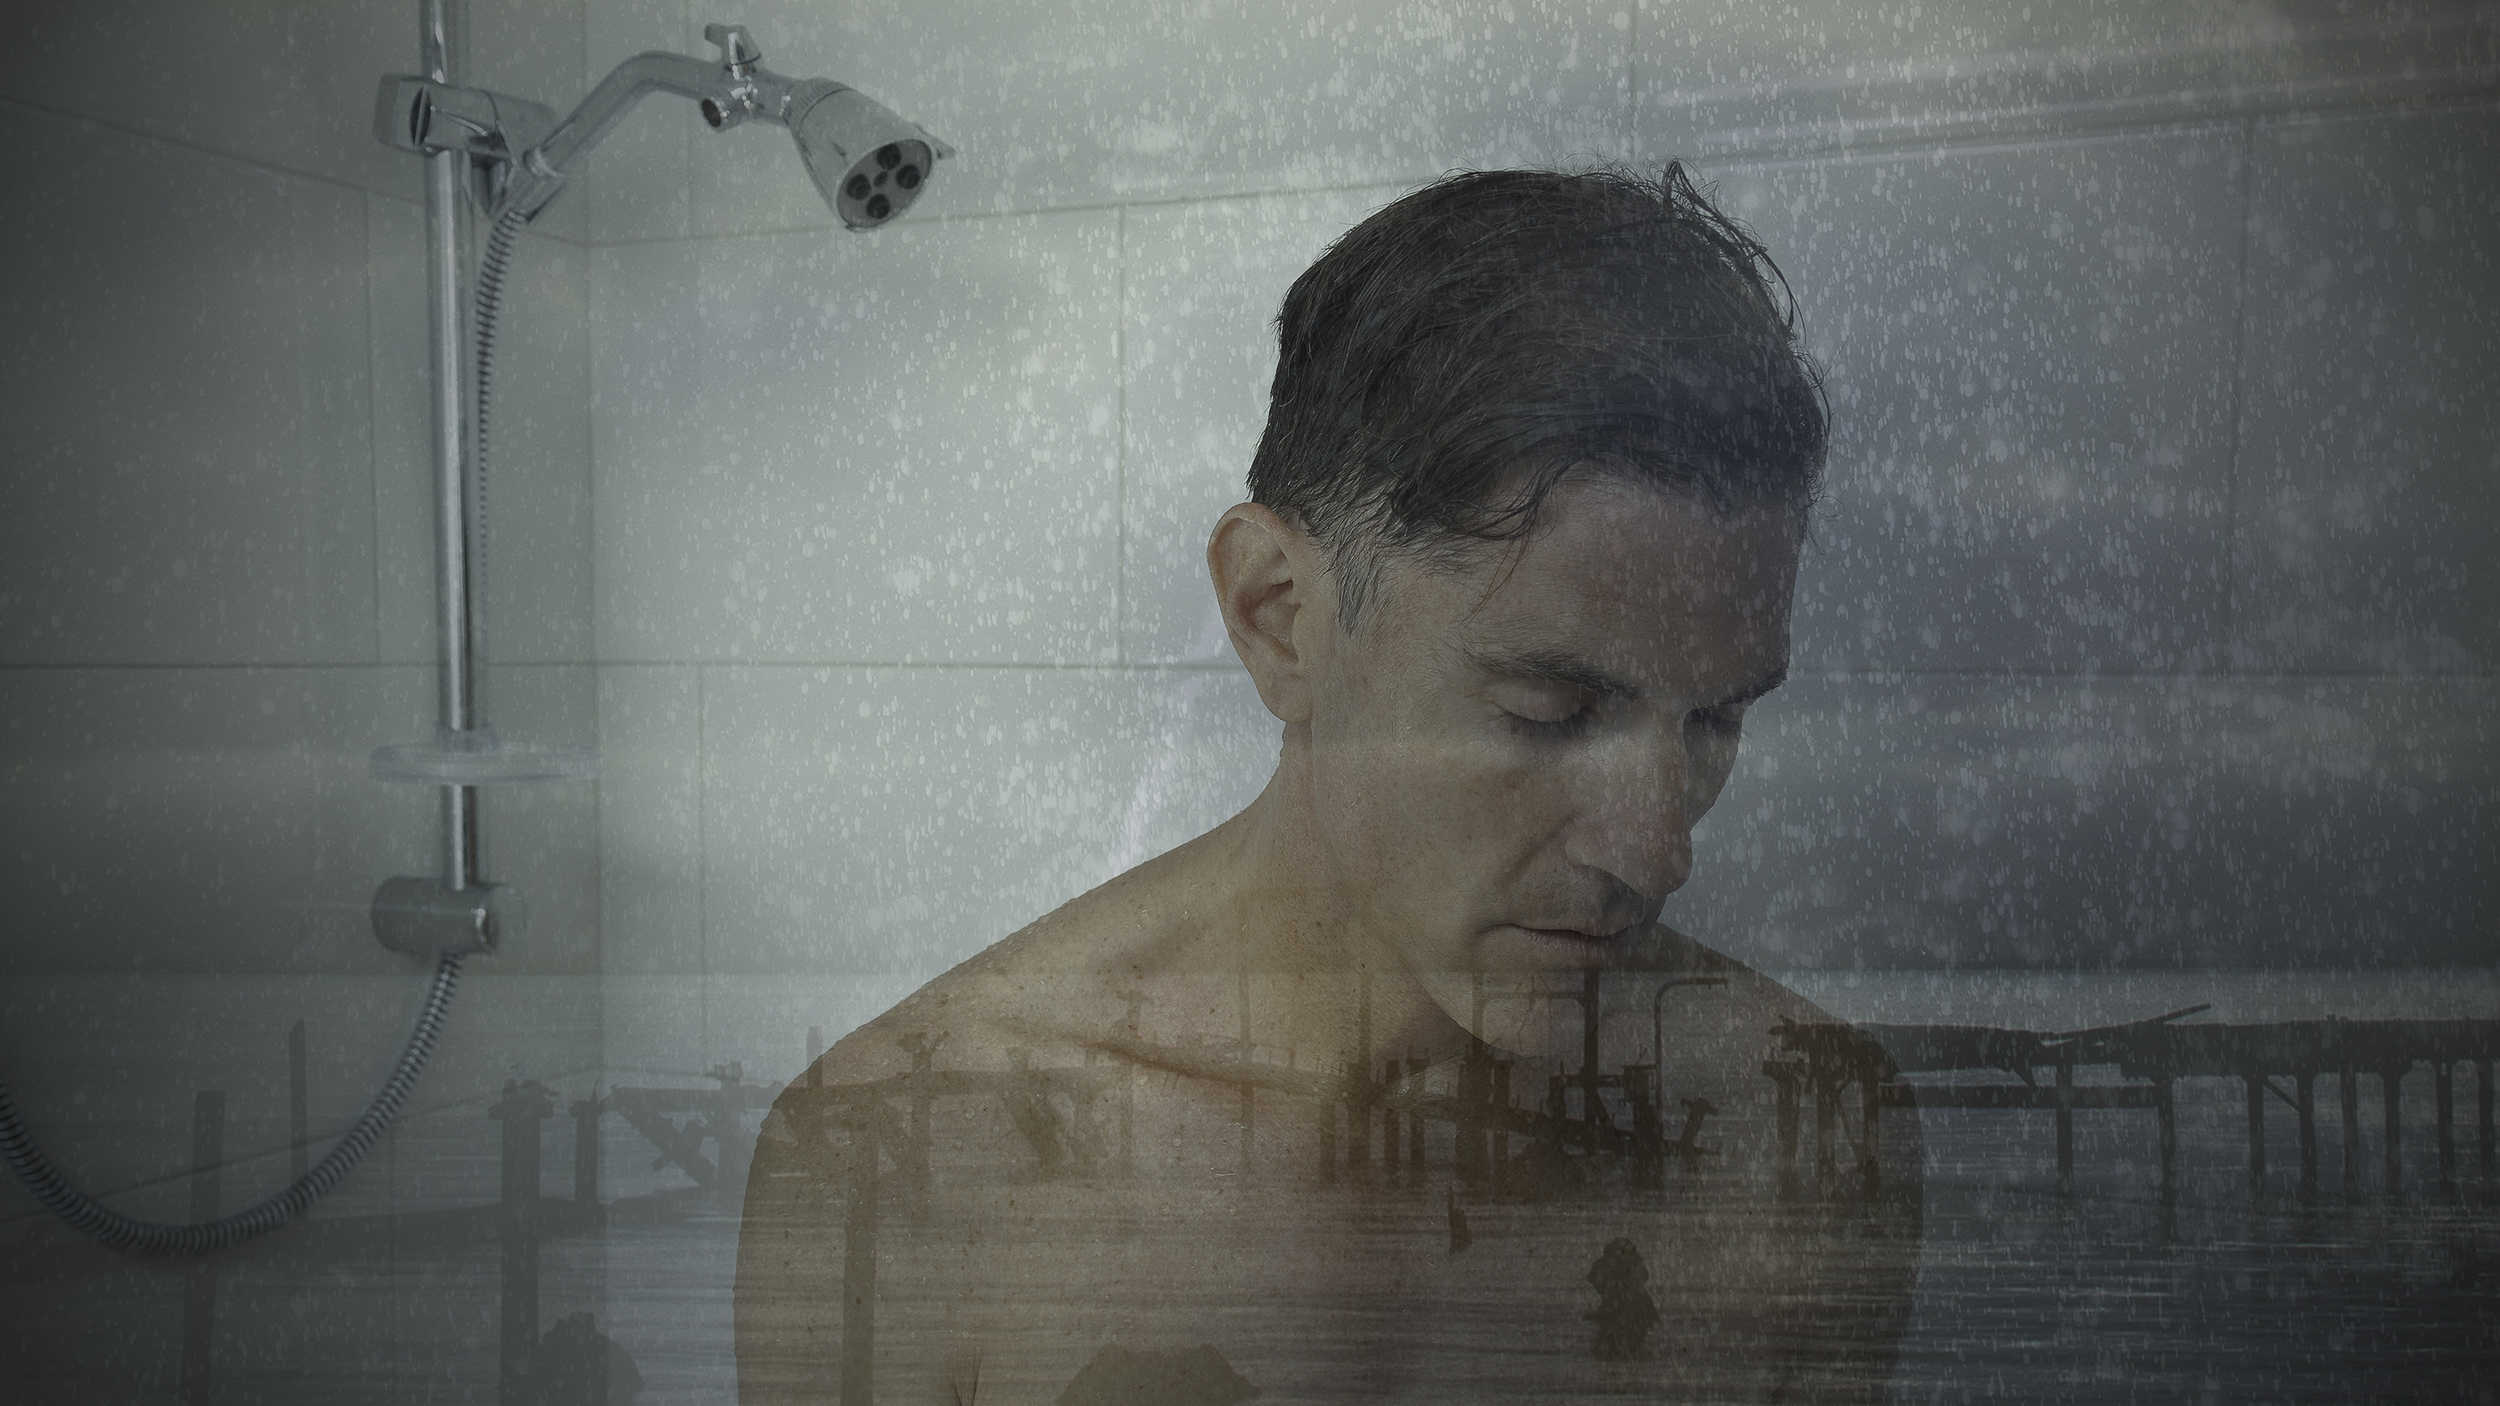 Image_12_Fortunato_J_Shower_May_9_Cropped_BKPT_Sharpen.jpg